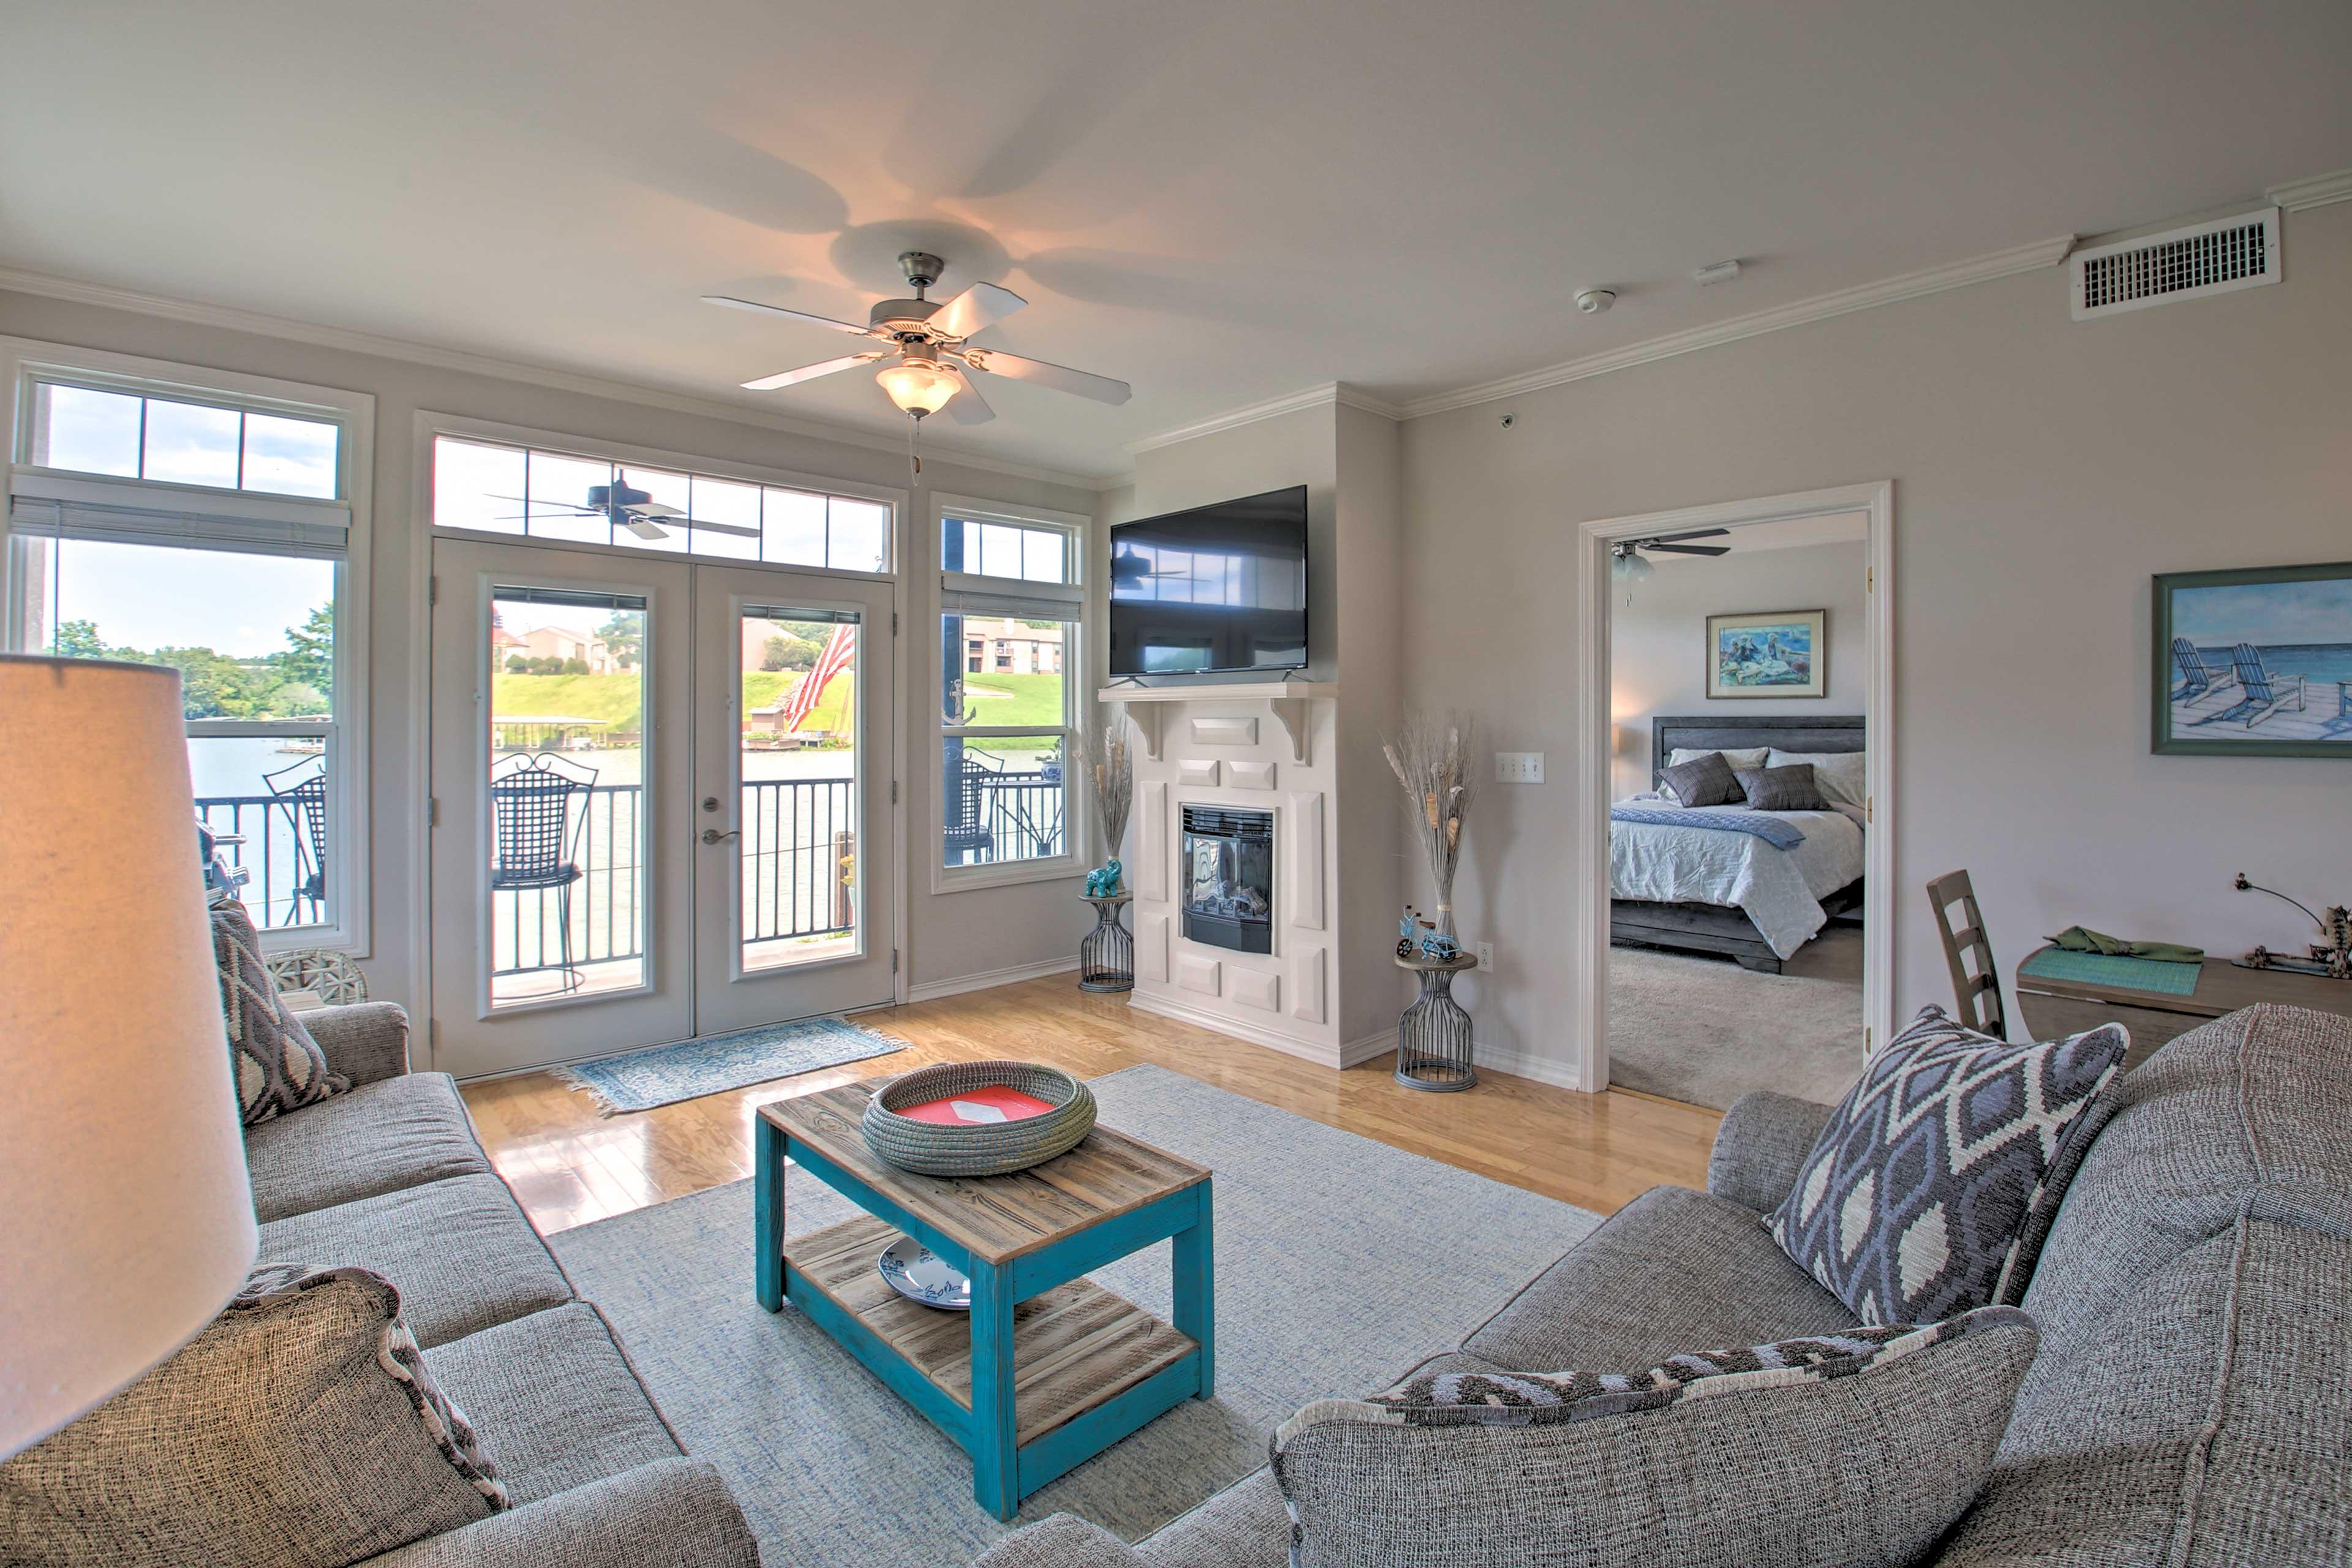 Make this 2-bed, 2-bath vacation rental condo your Arkansas home base.